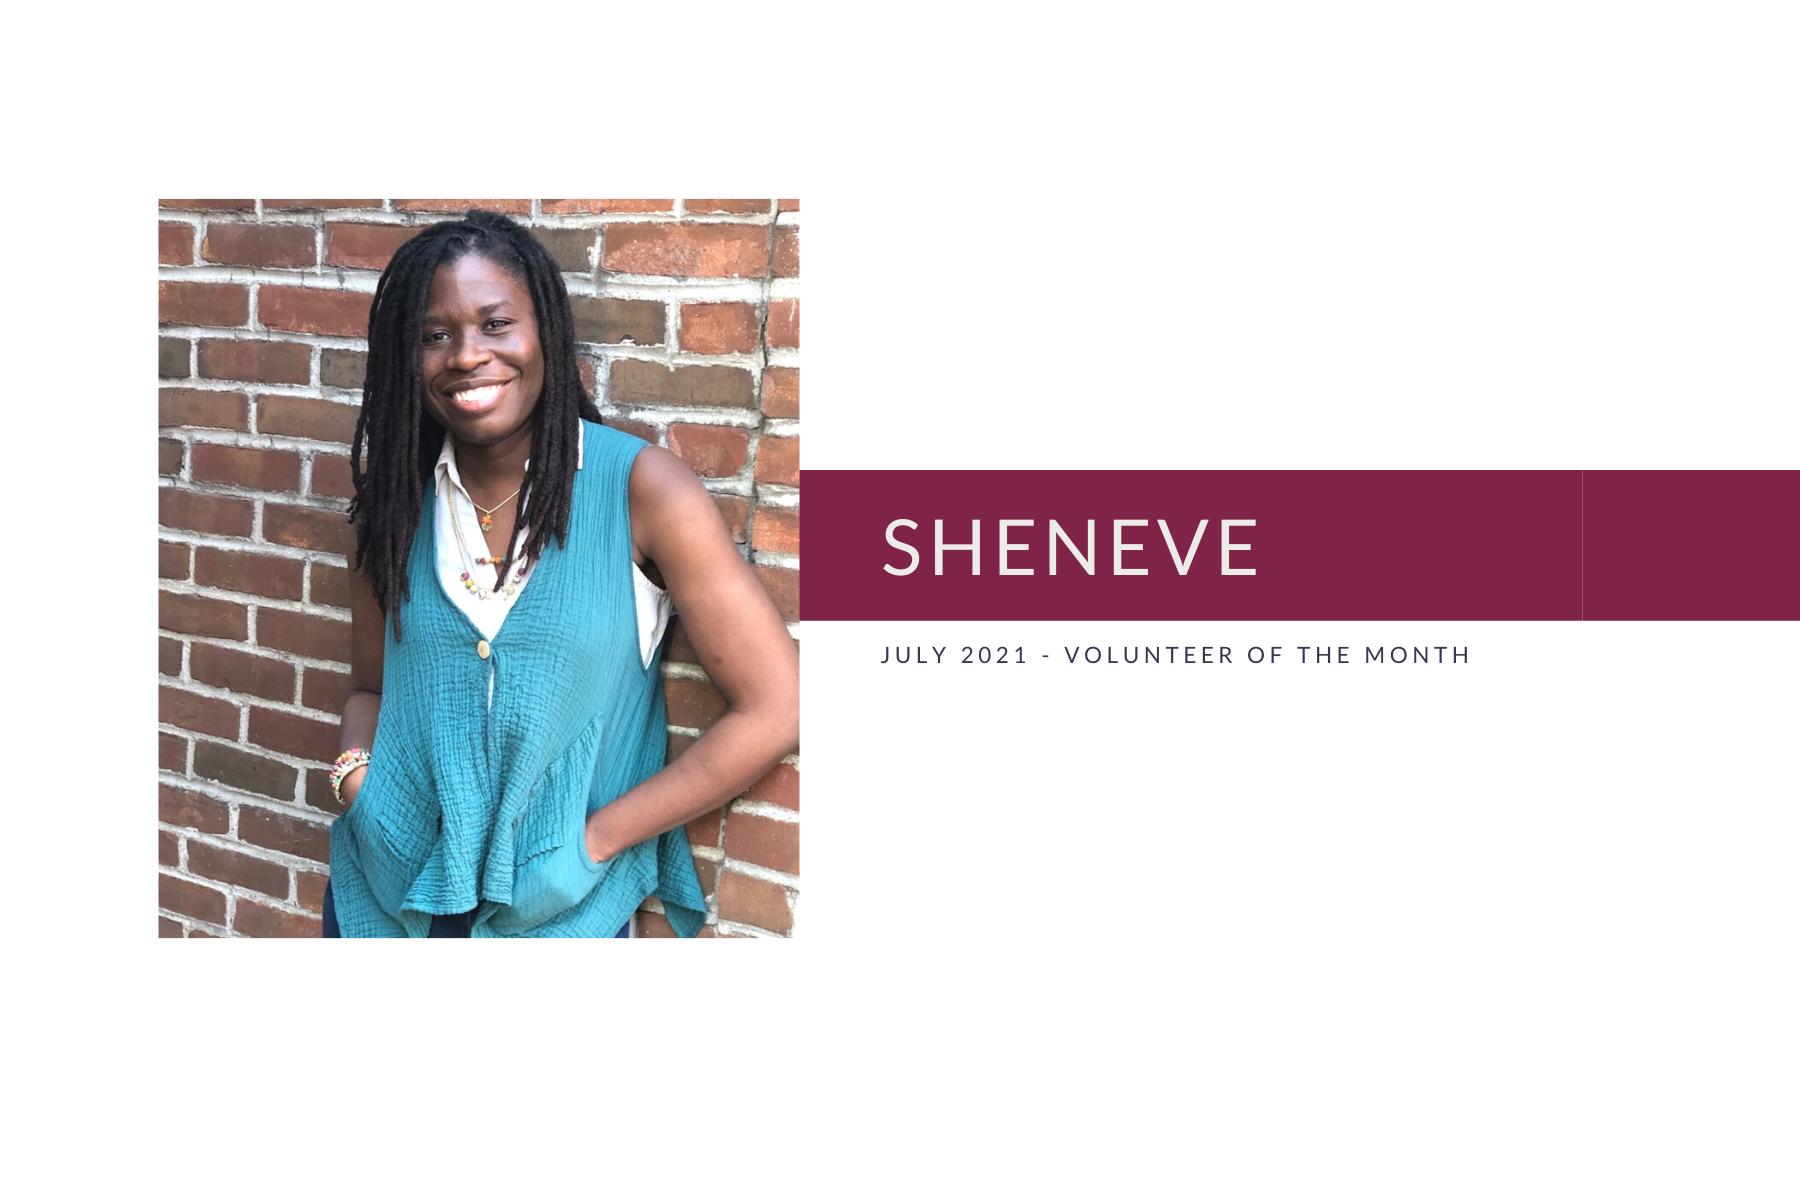 Meet Sheneve: Volunteer of the Month (July 2021)